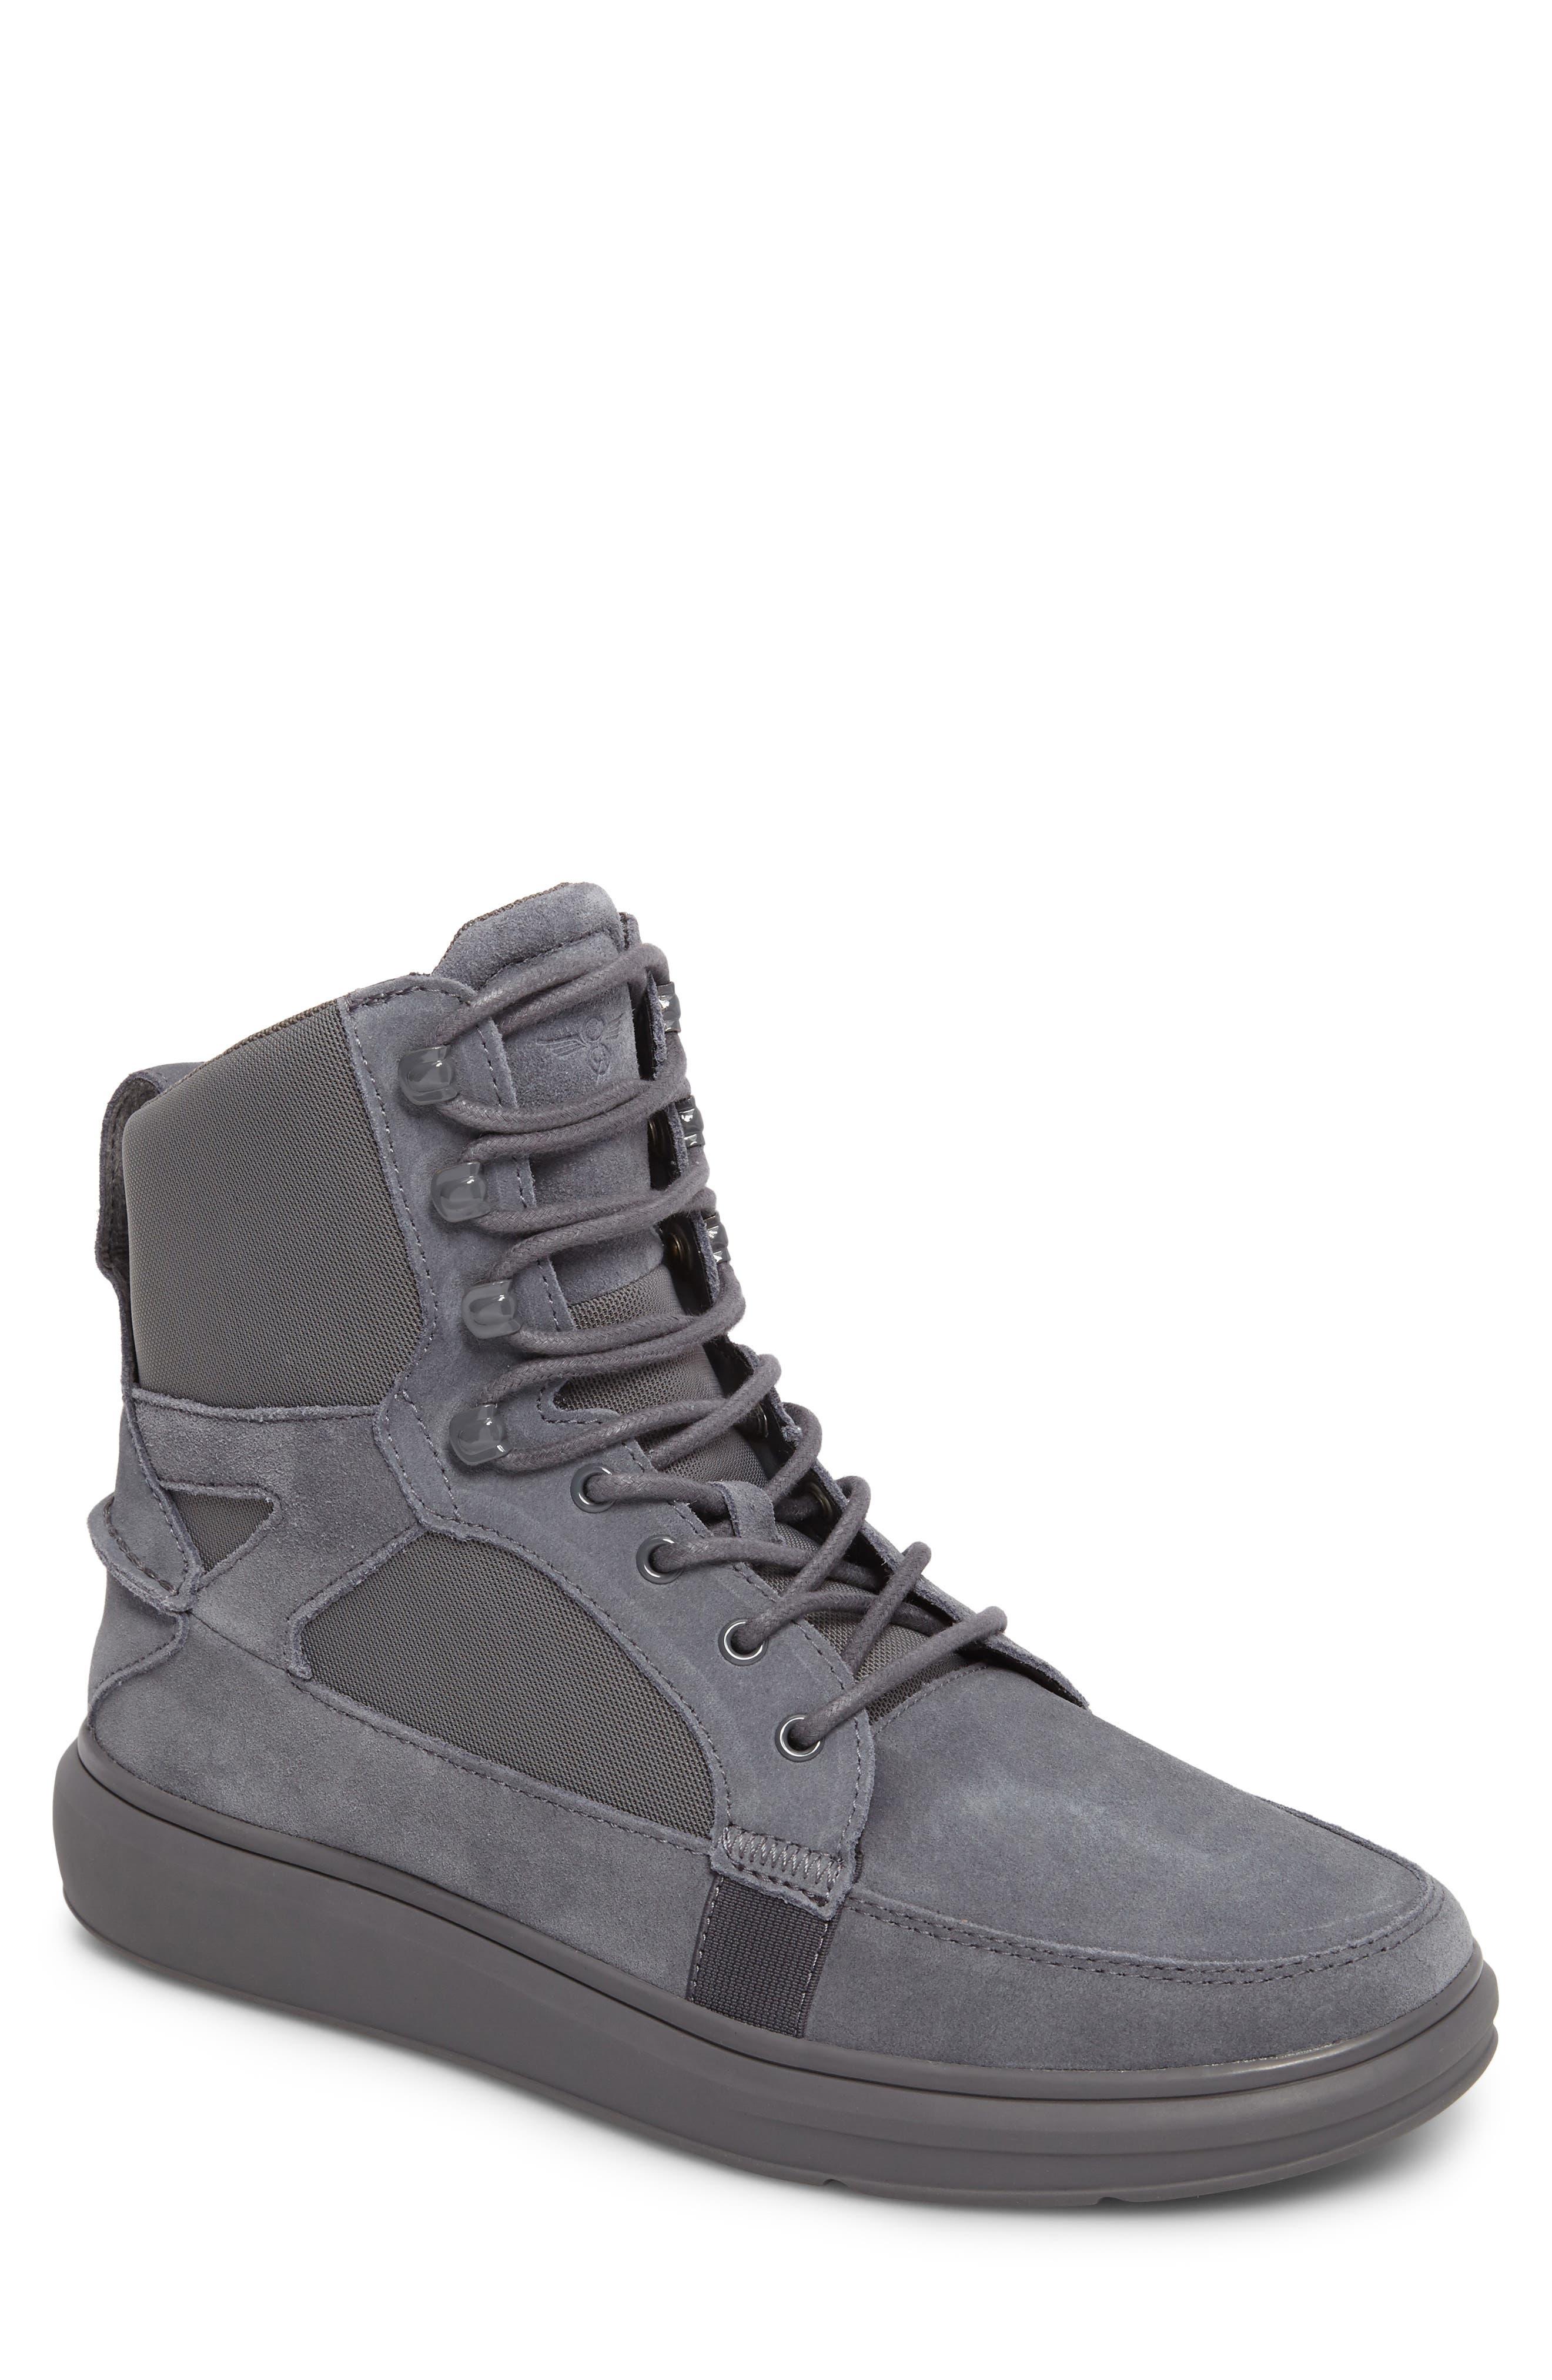 Desimo Sneaker,                             Main thumbnail 1, color,                             Smoke Leather